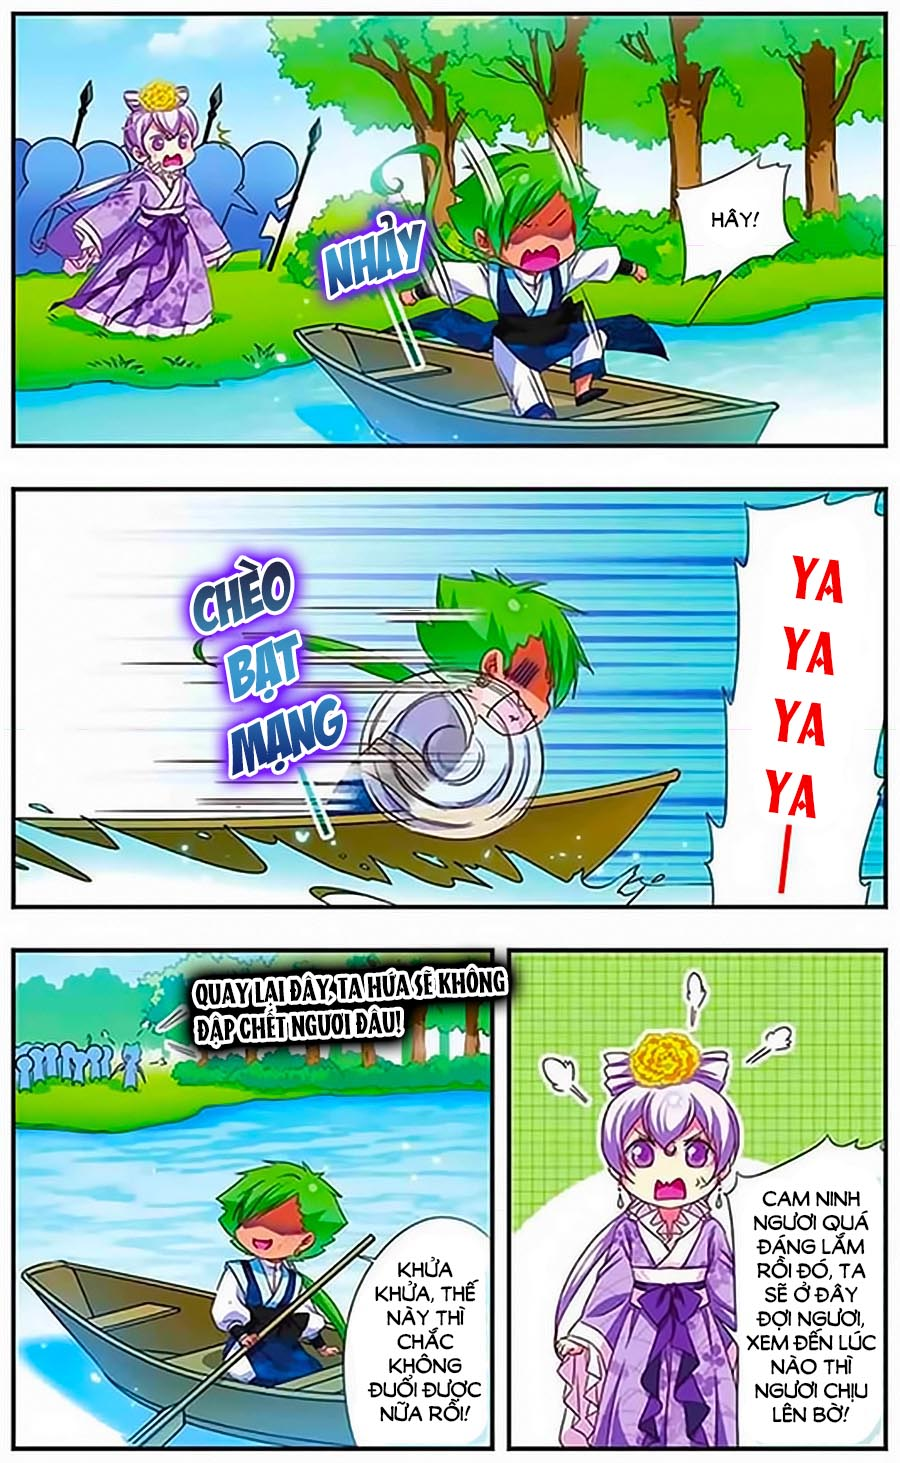 Manh Tam Quốc Chap 111 - Next Chap 112